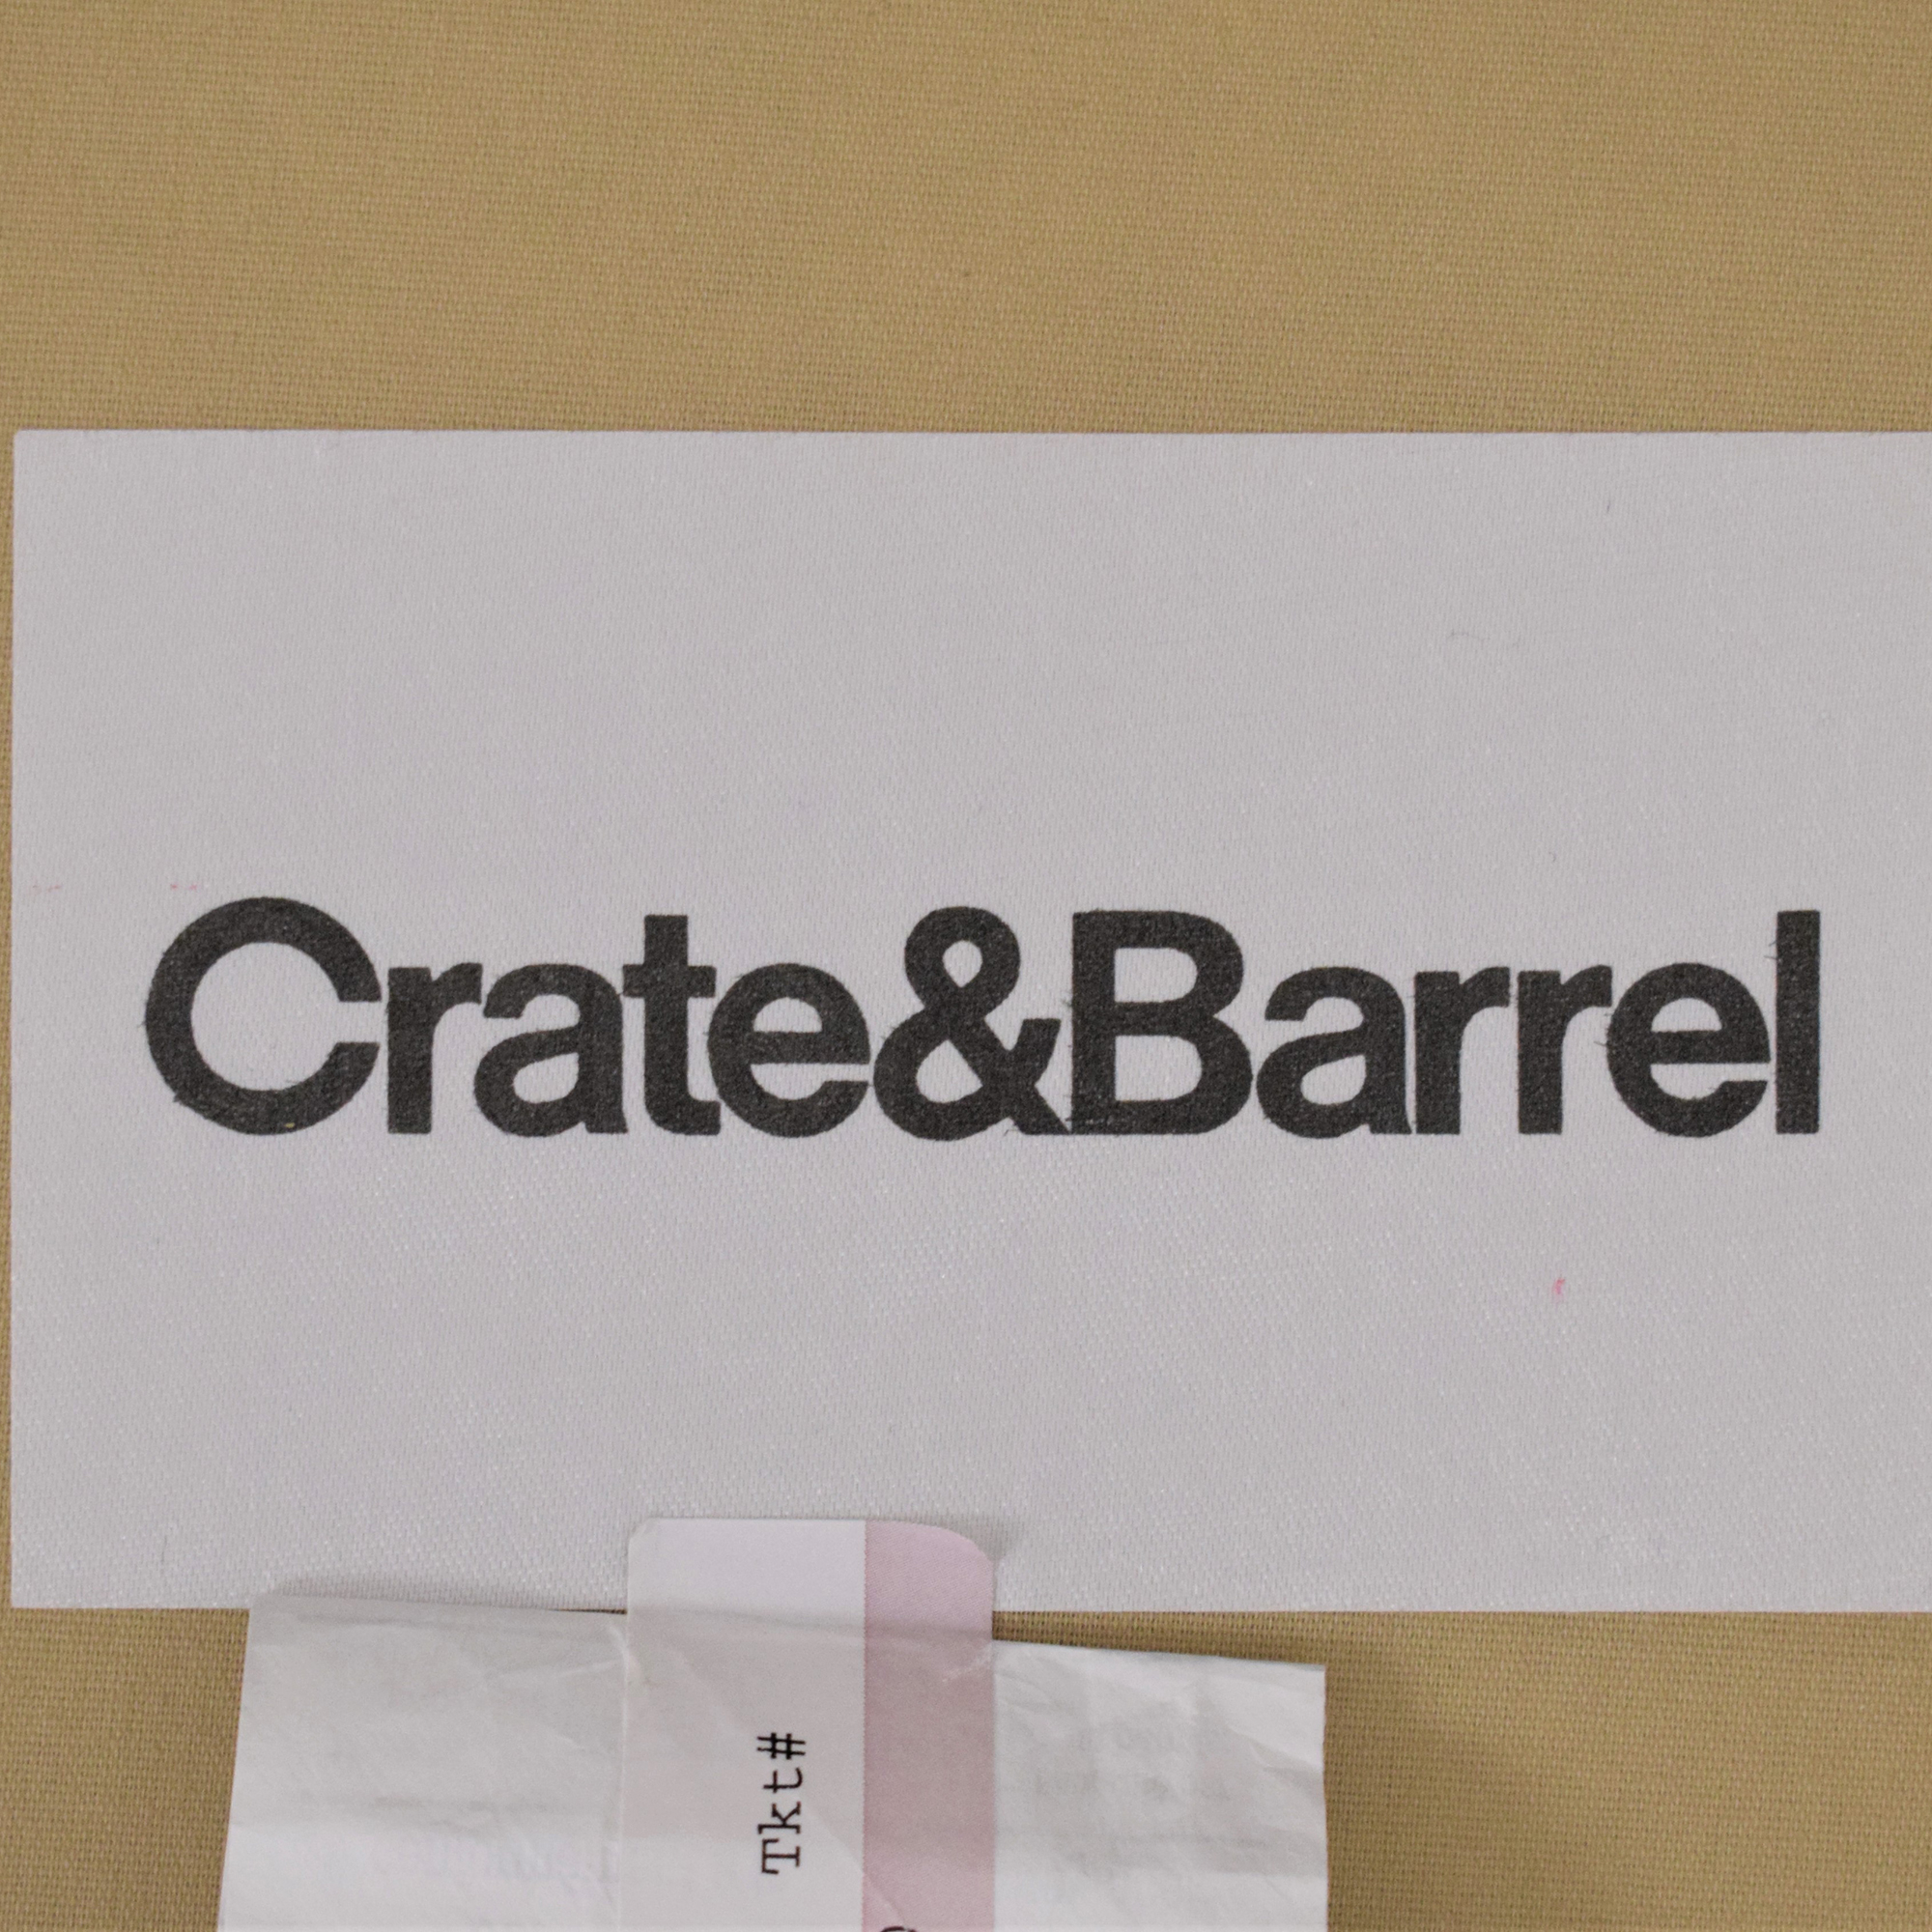 Crate & Barrel Crate & Barrel Lounge II 2-Piece Sectional Sofa second hand